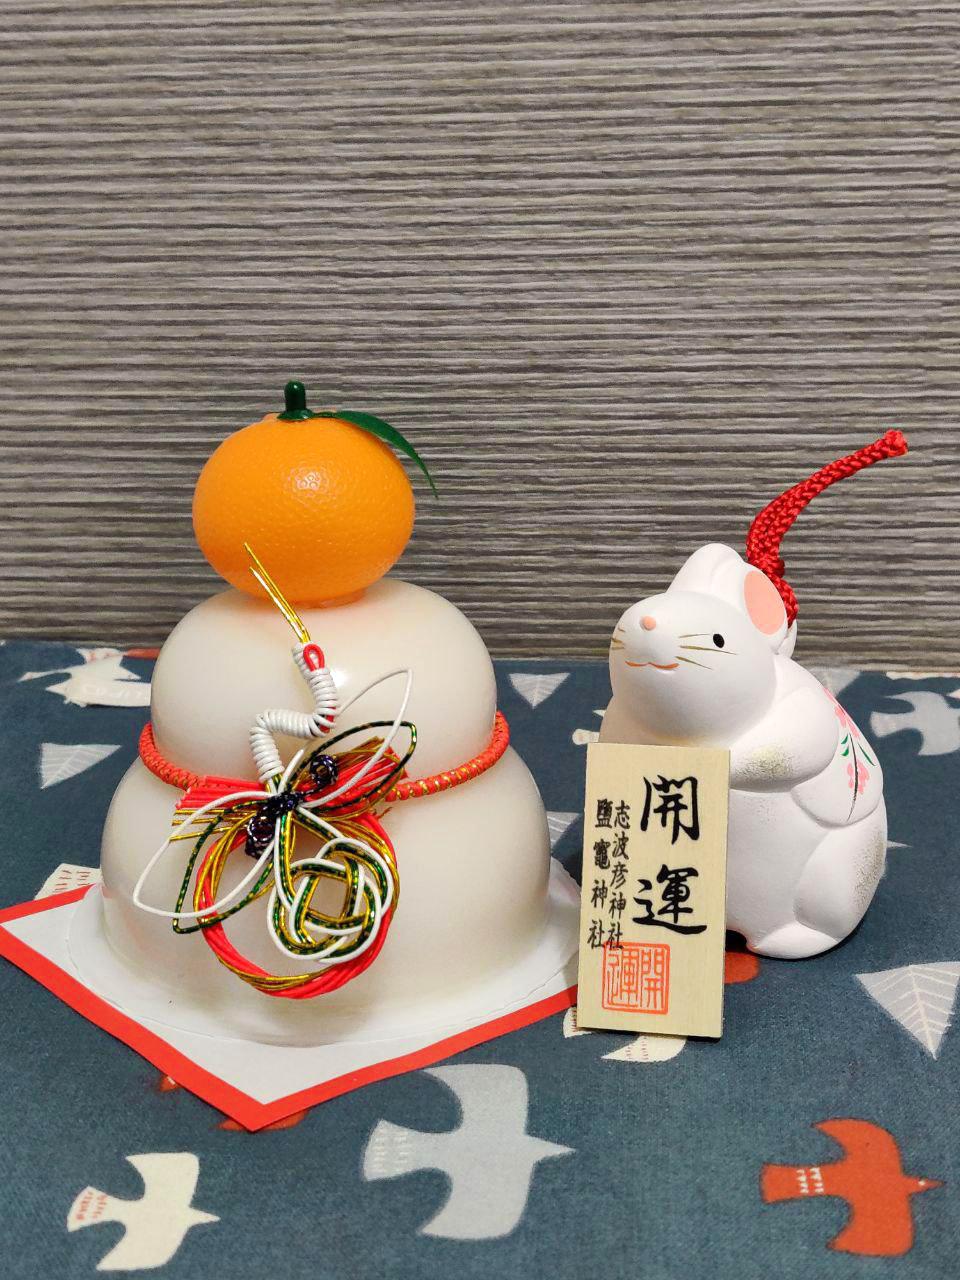 photo_2019-12-28_23-01-20.jpg